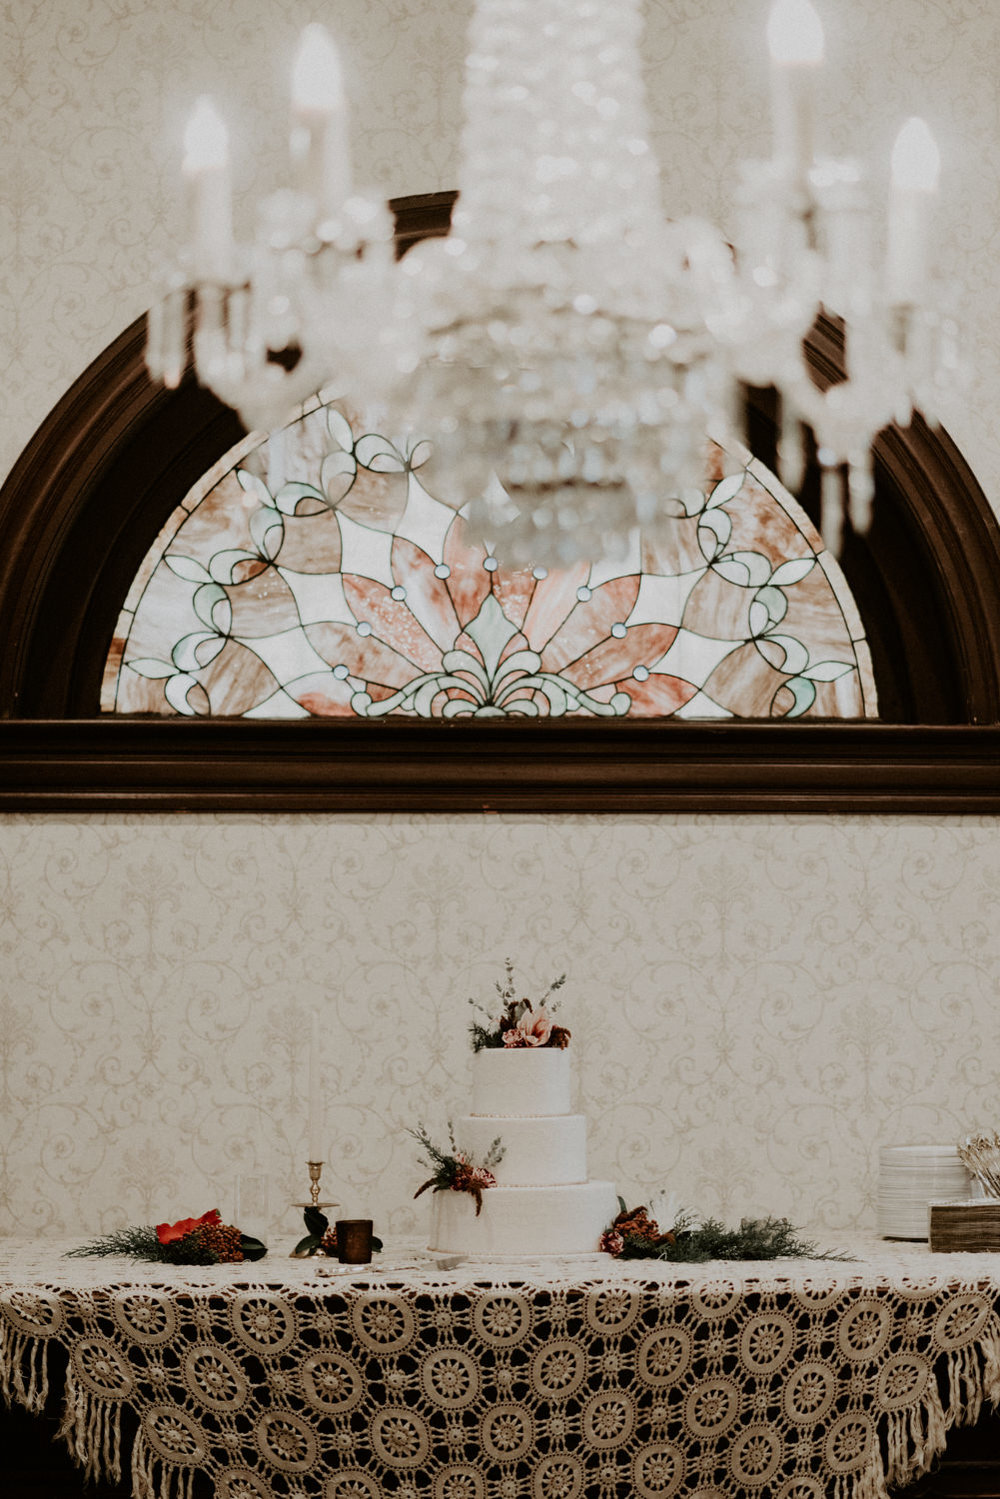 chandelier and wedding cake display